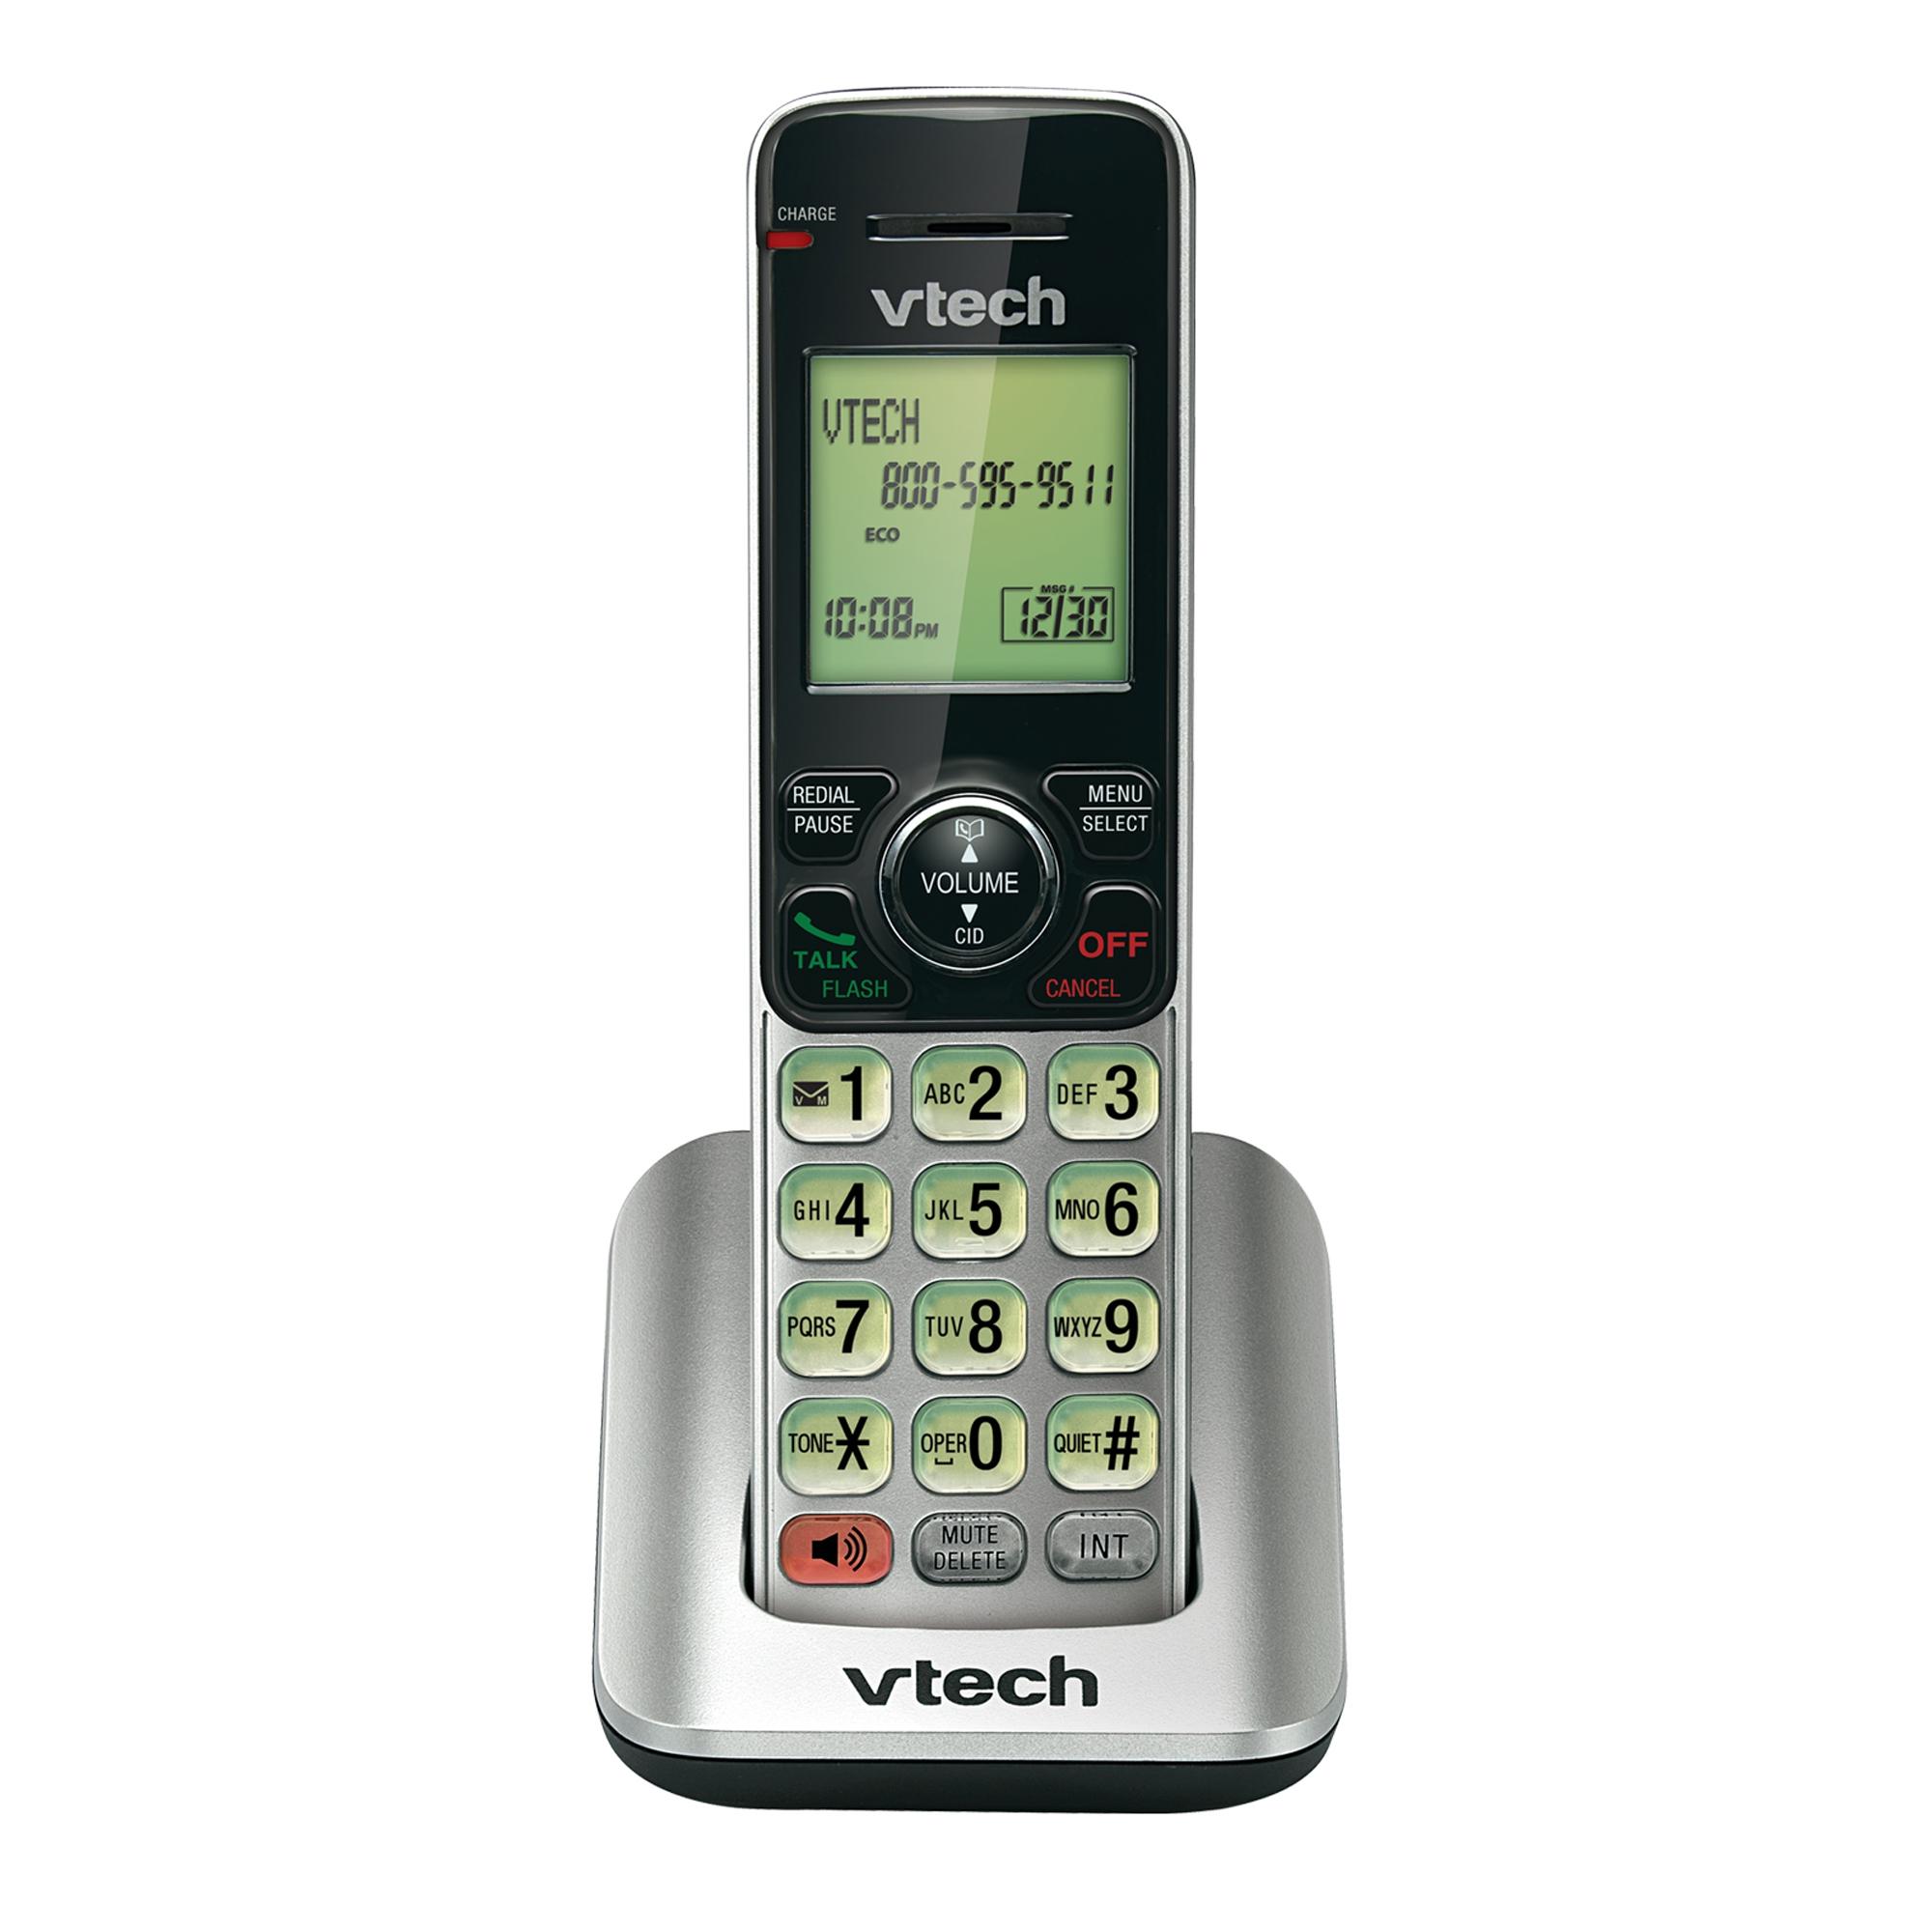 Vtech DECT 6.0 Accessory Handset with Caller ID/Call Waiting - for vtech CS66xx series phones